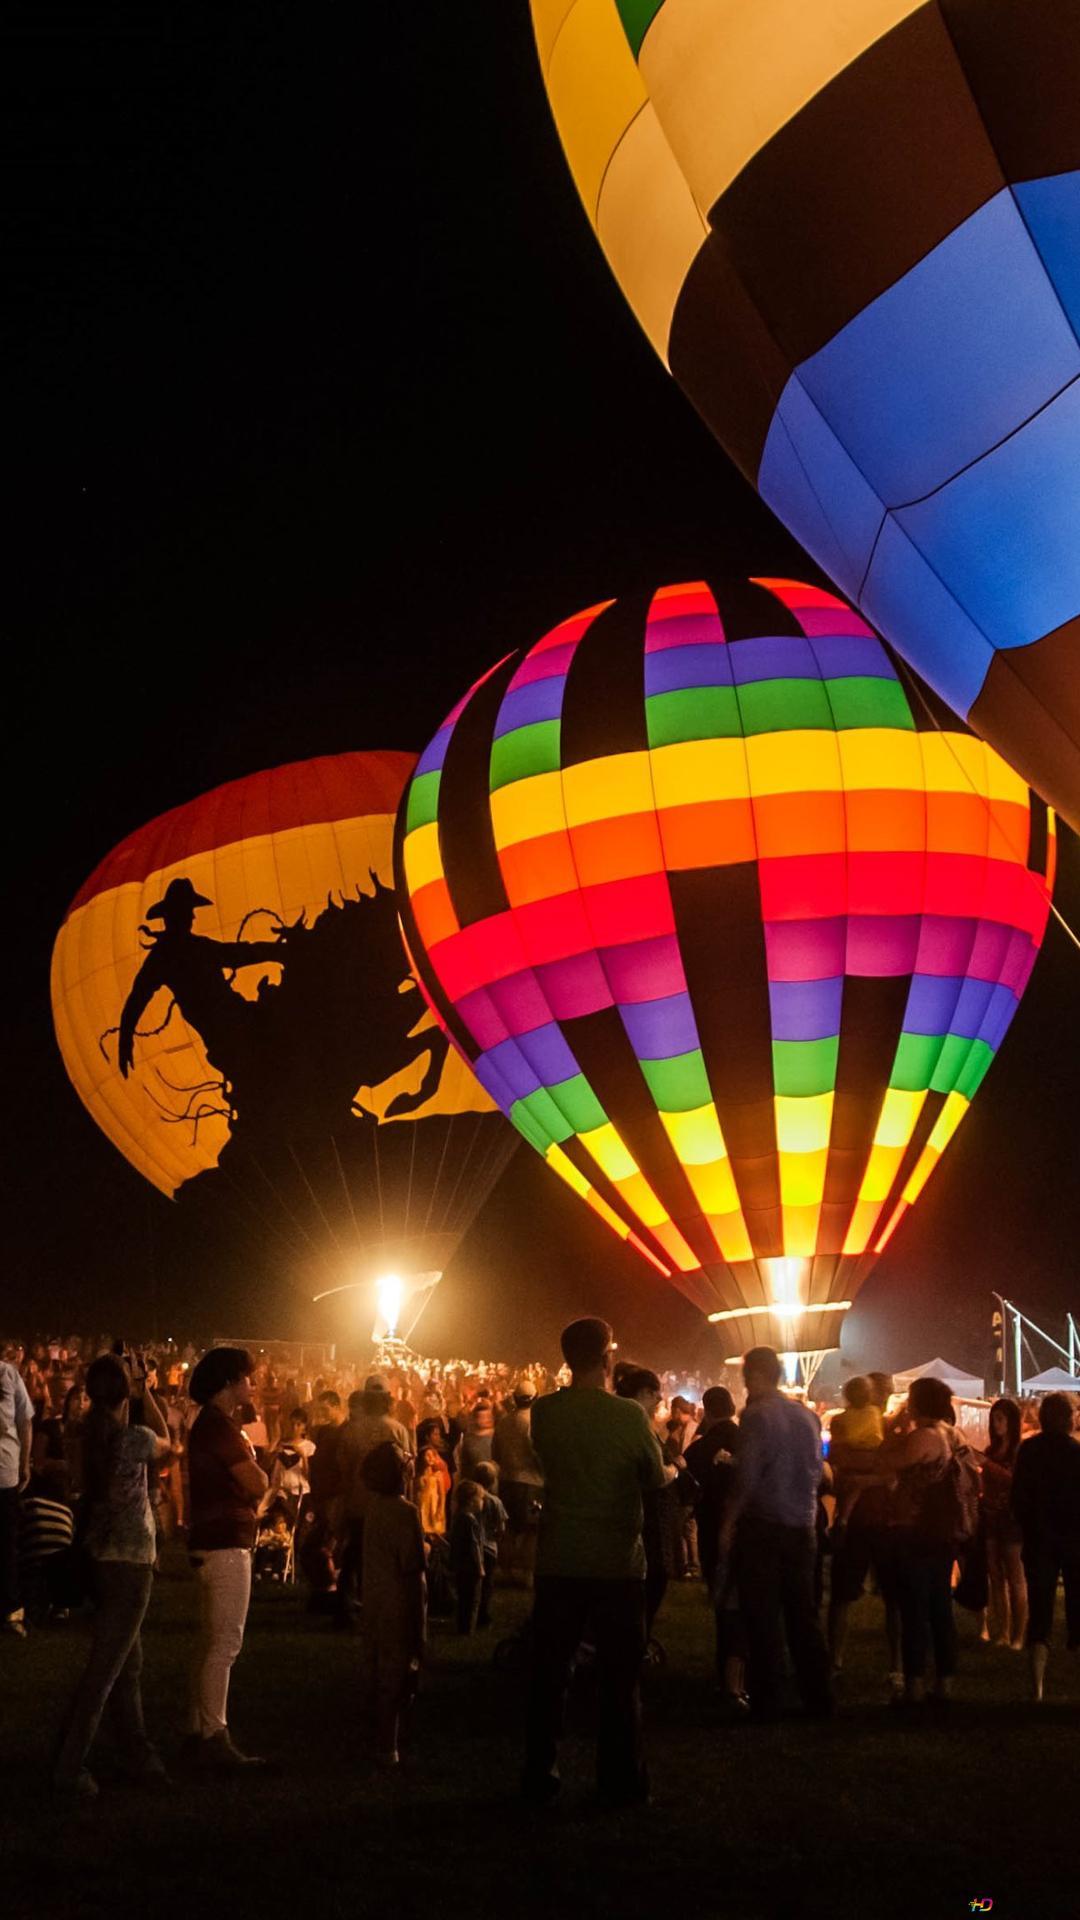 Colourful Hot Air Balloon Hd Wallpaper Download